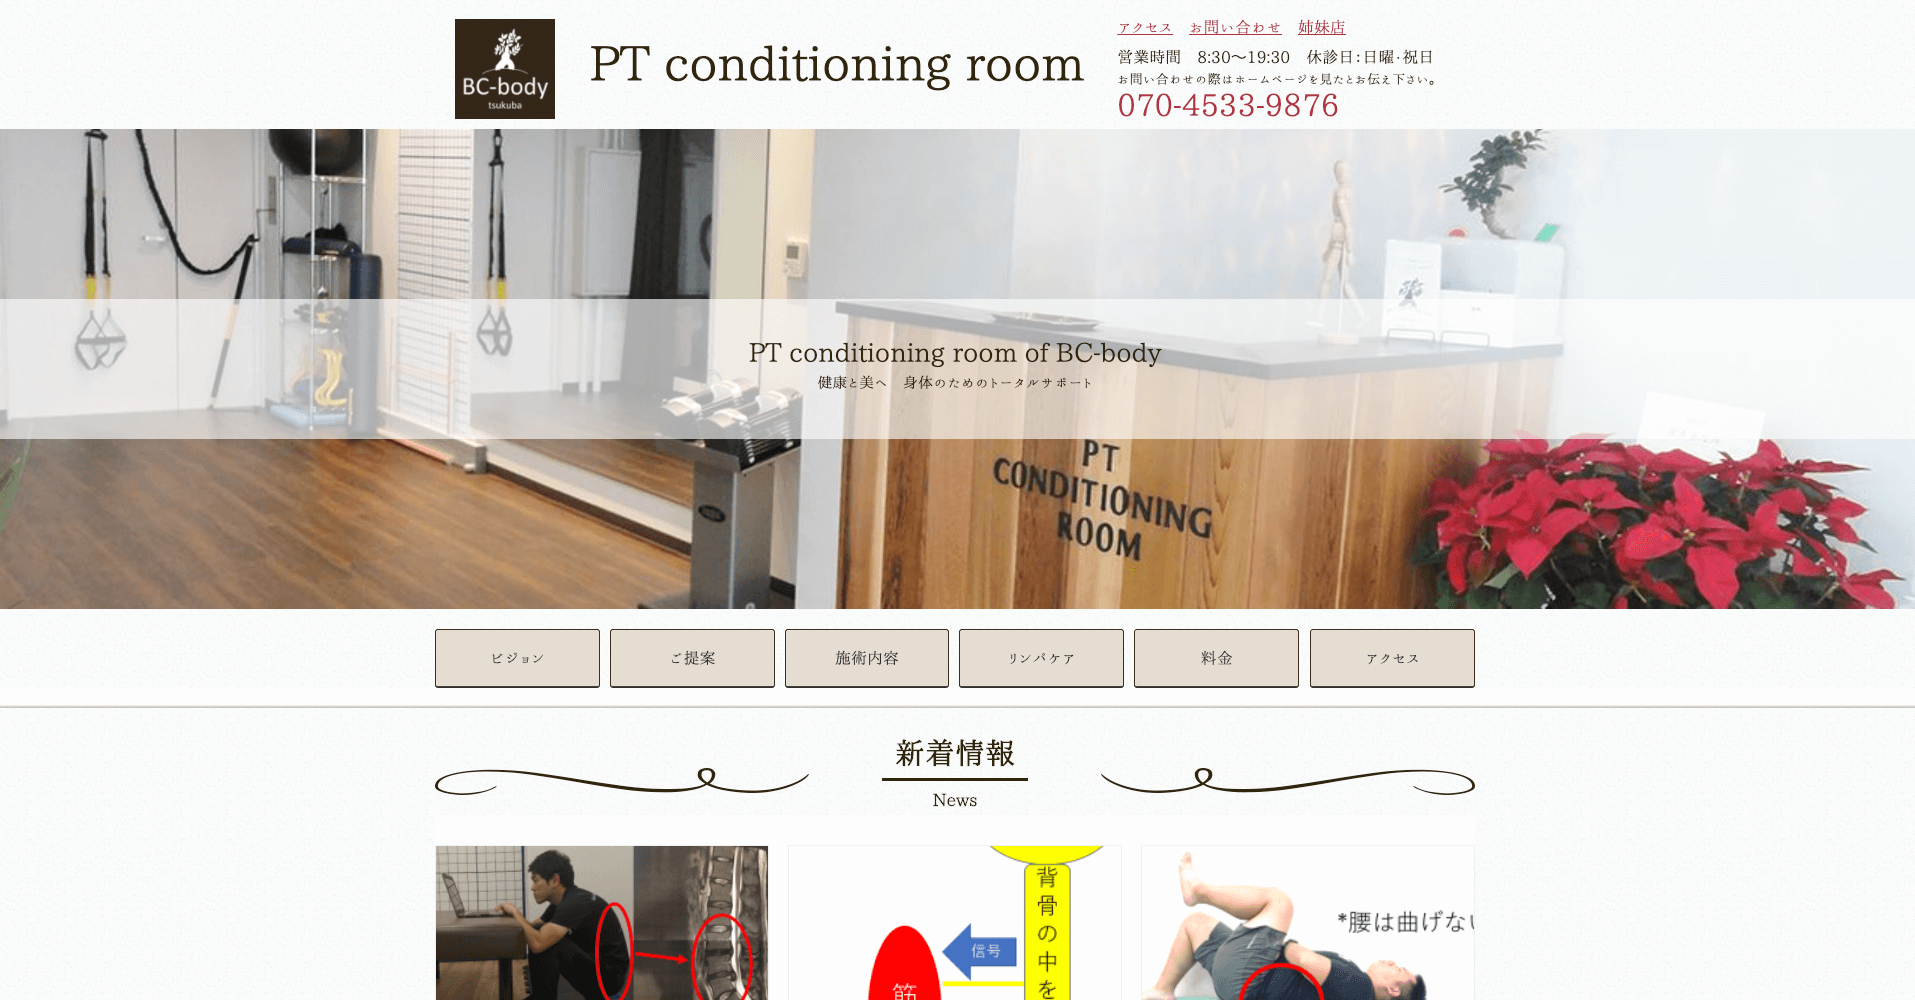 PT コンディショニング ルーム(パーソナルスタジオ)